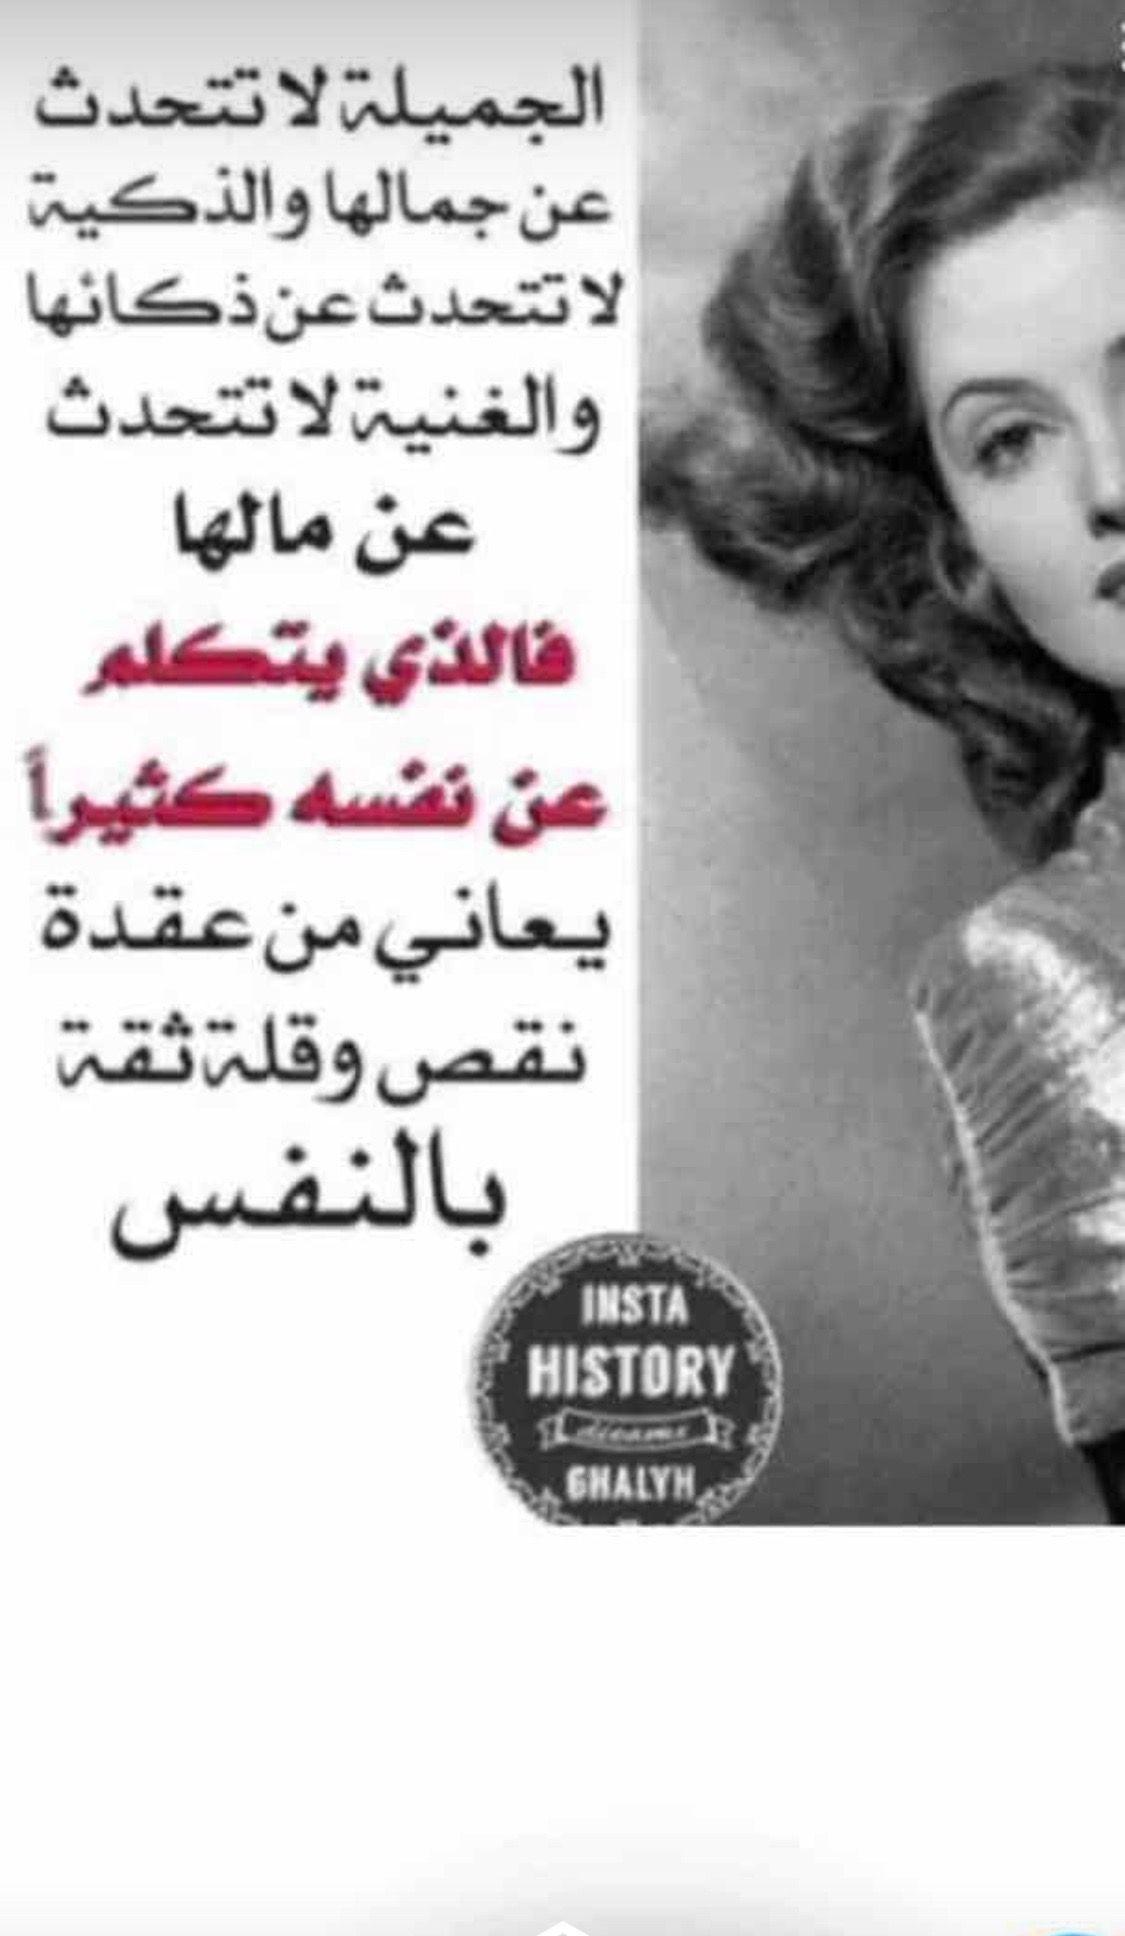 Pin By Sultan On روائع الكلام T Shirts For Women Women T Shirt